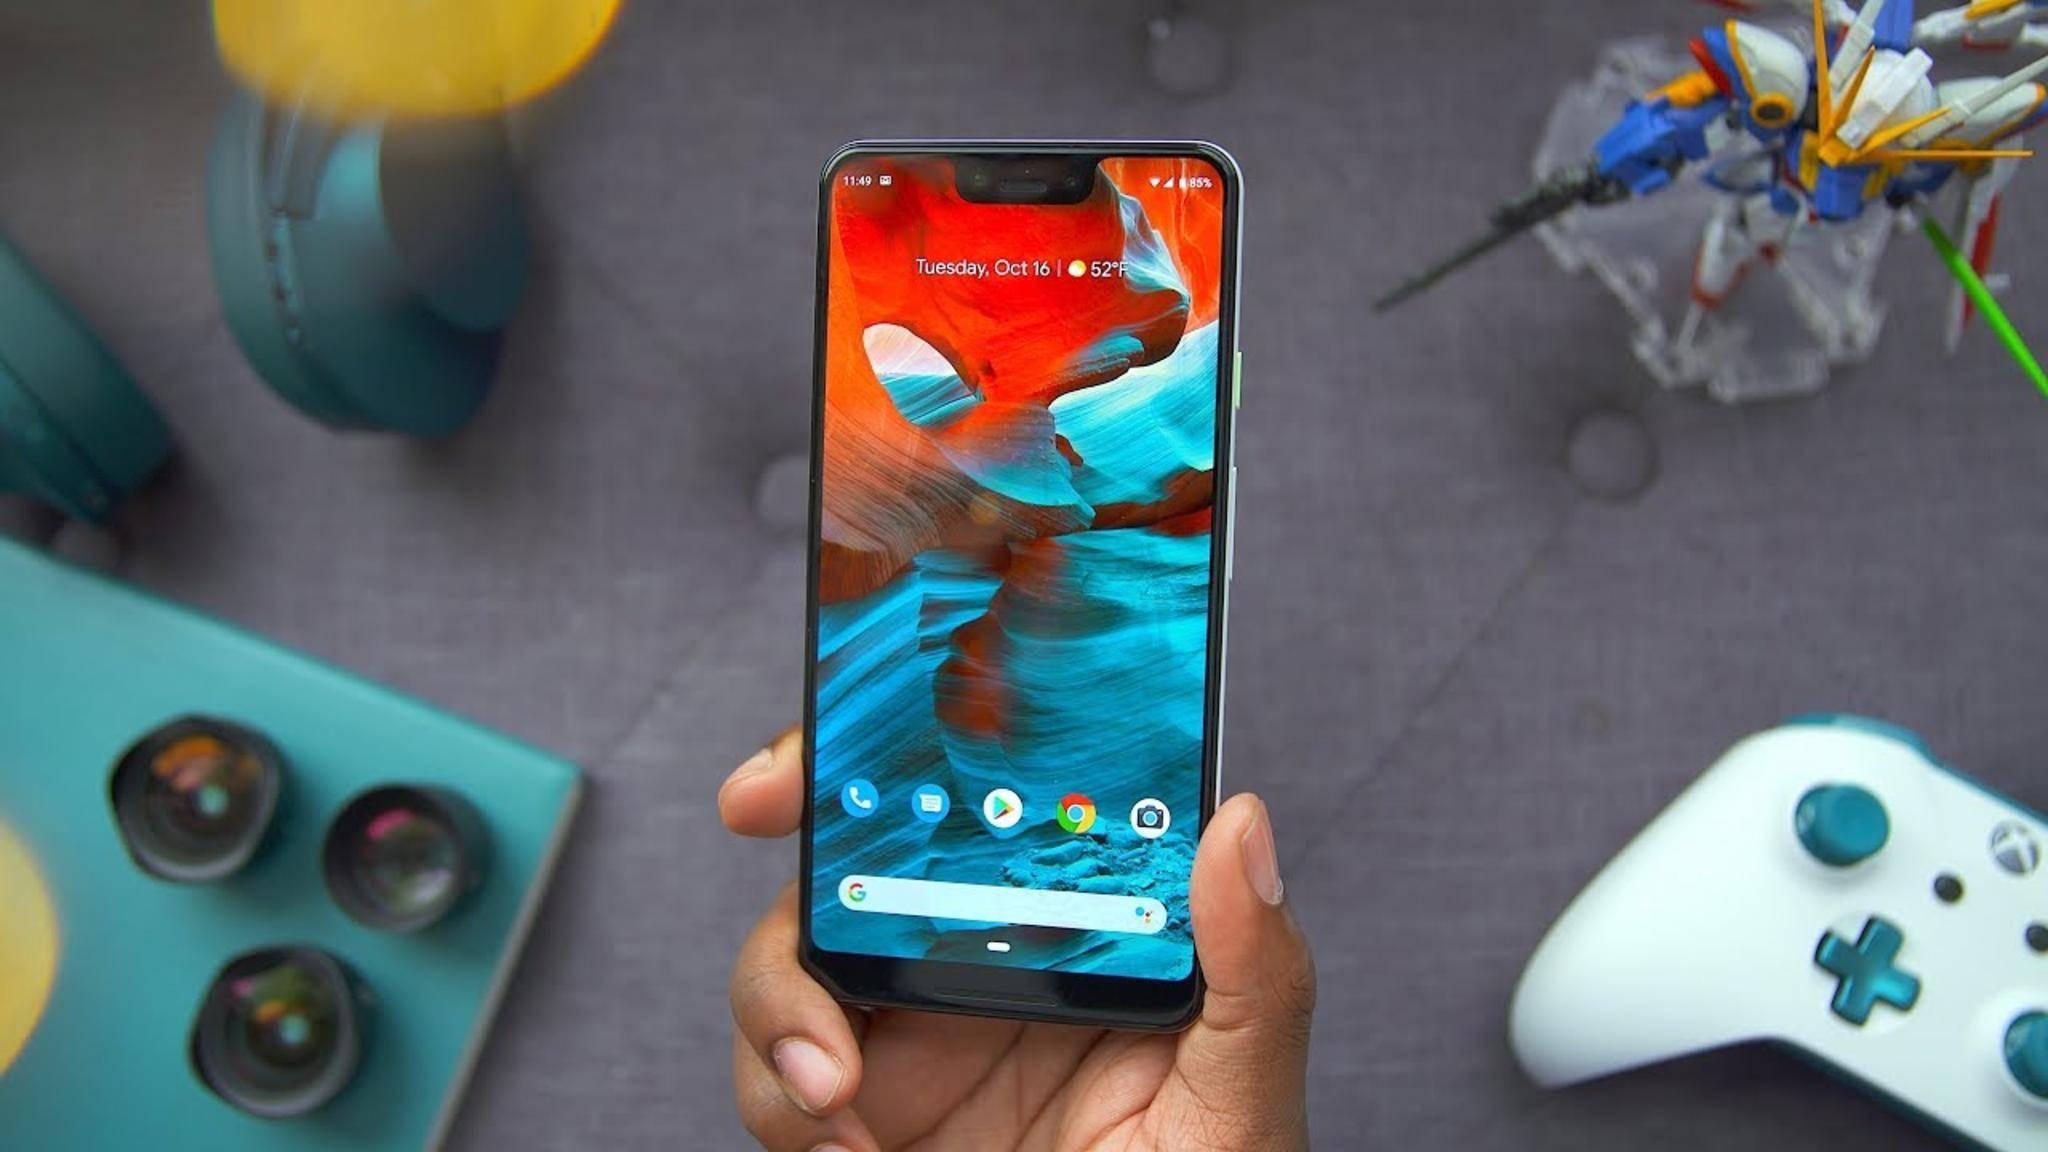 Wie das Pixel 3 XL sollen bald alle Android-Smartphones regelmäßige Sicherheitsupdates bekommen.